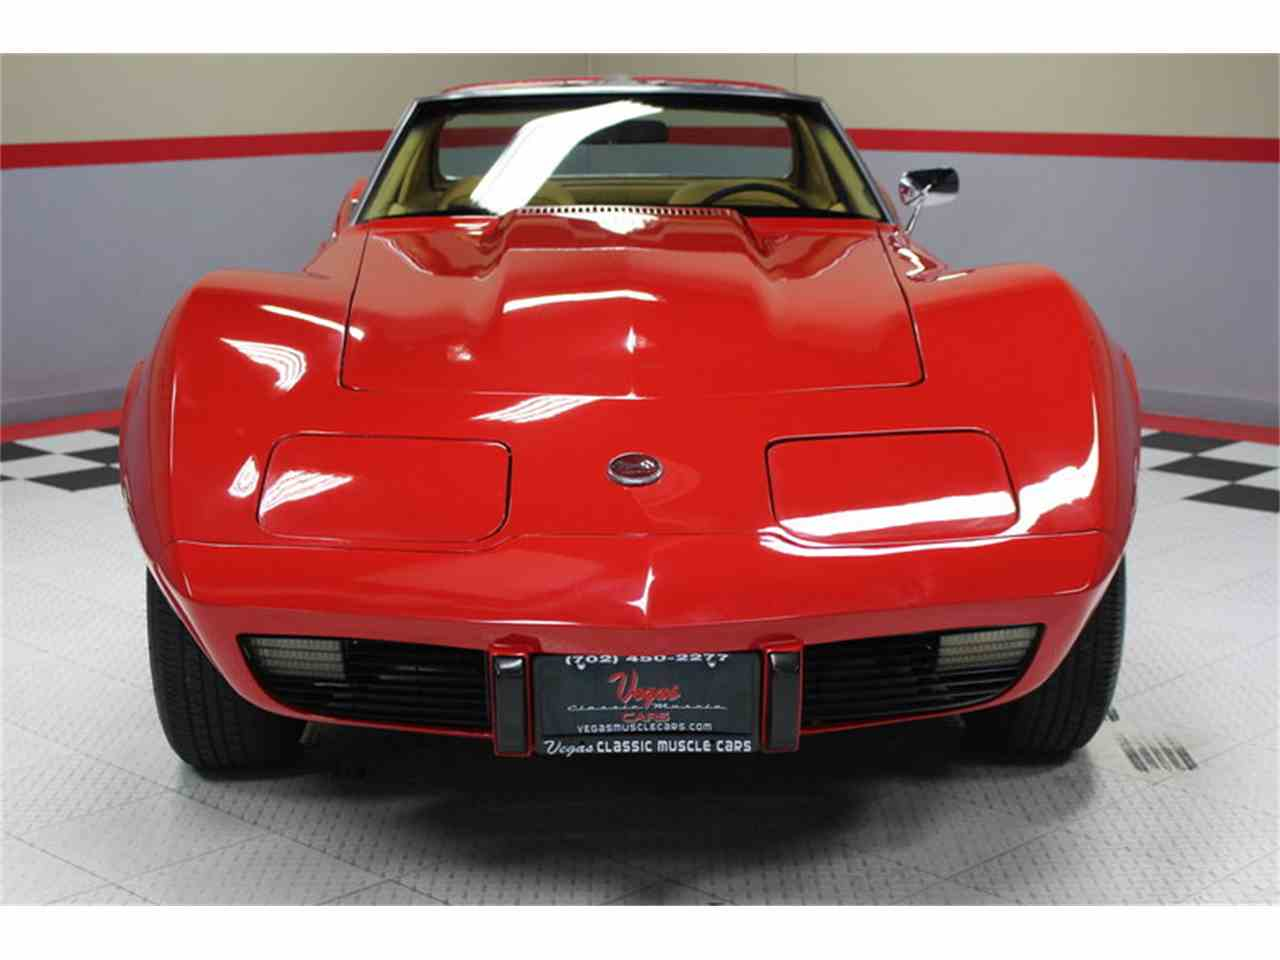 1974 Chevrolet Corvette for Sale | ClassicCars.com | CC-1050459